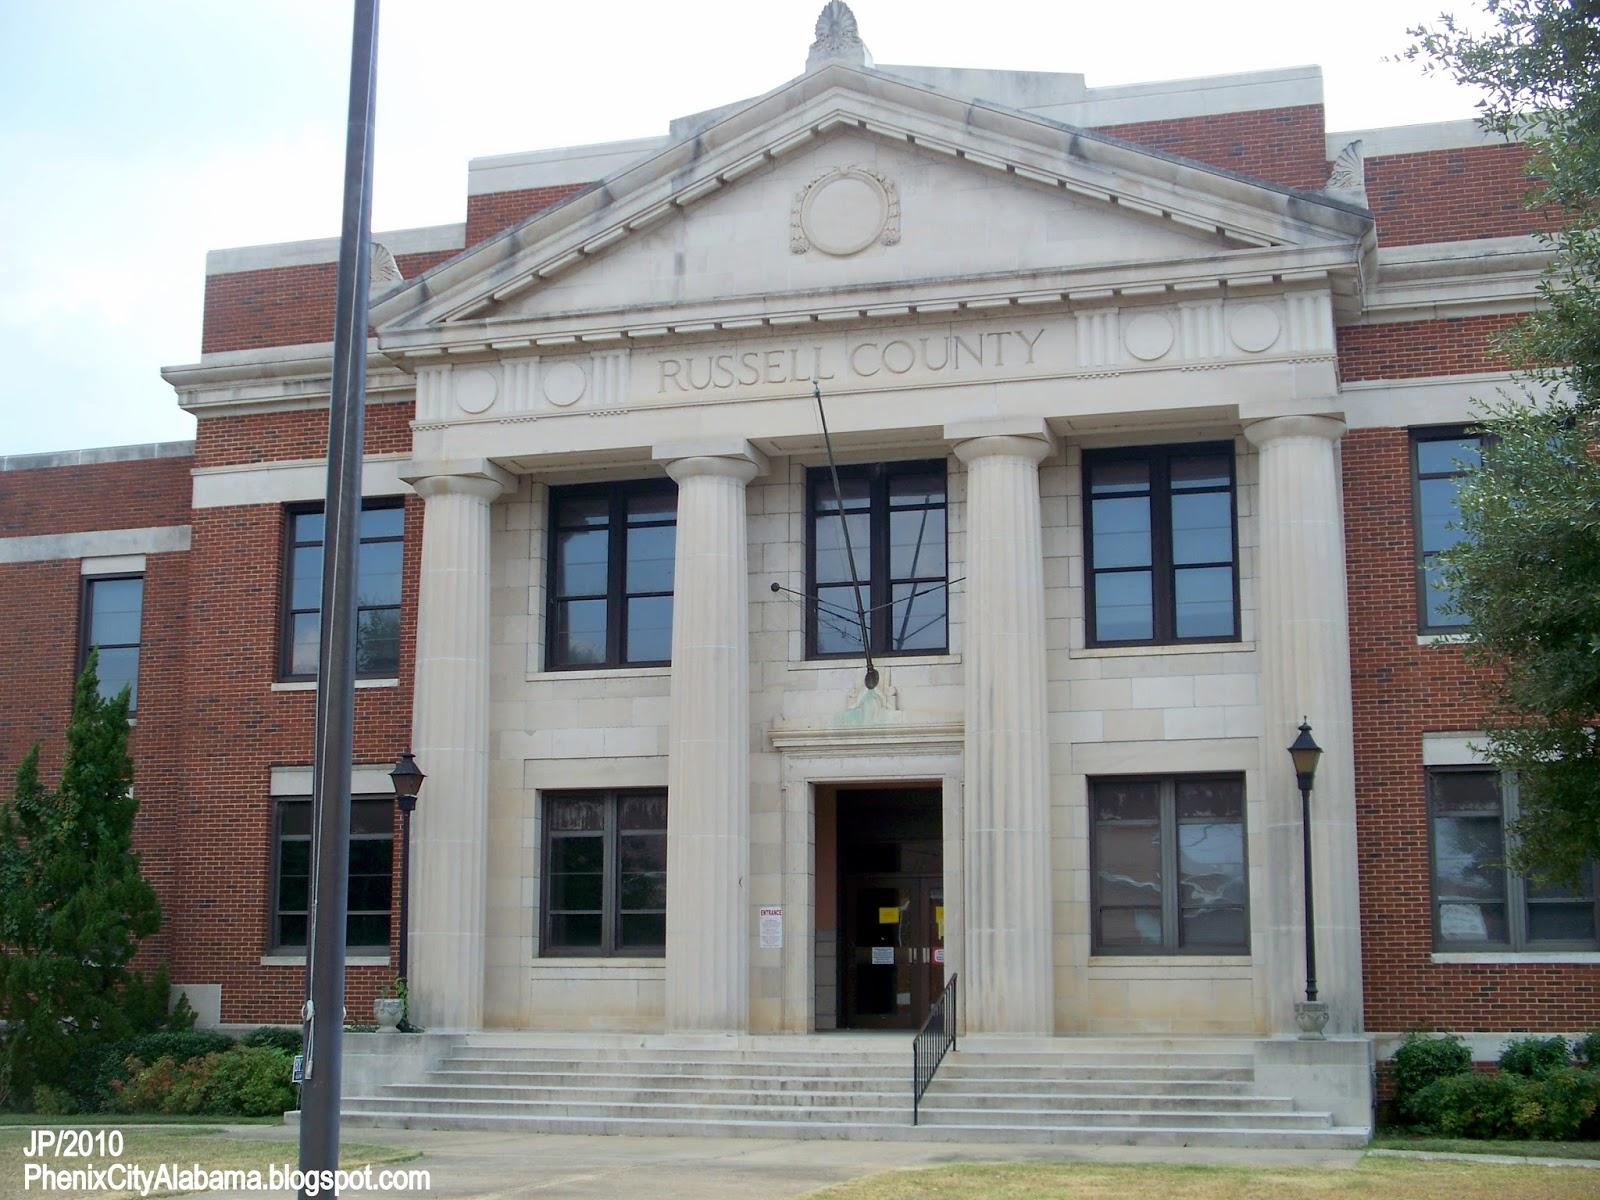 phenix city alabama russell cty restaurant bank dr hospital church russell county alabama court house phenix city alabama russell county courthouse phenix city alabama